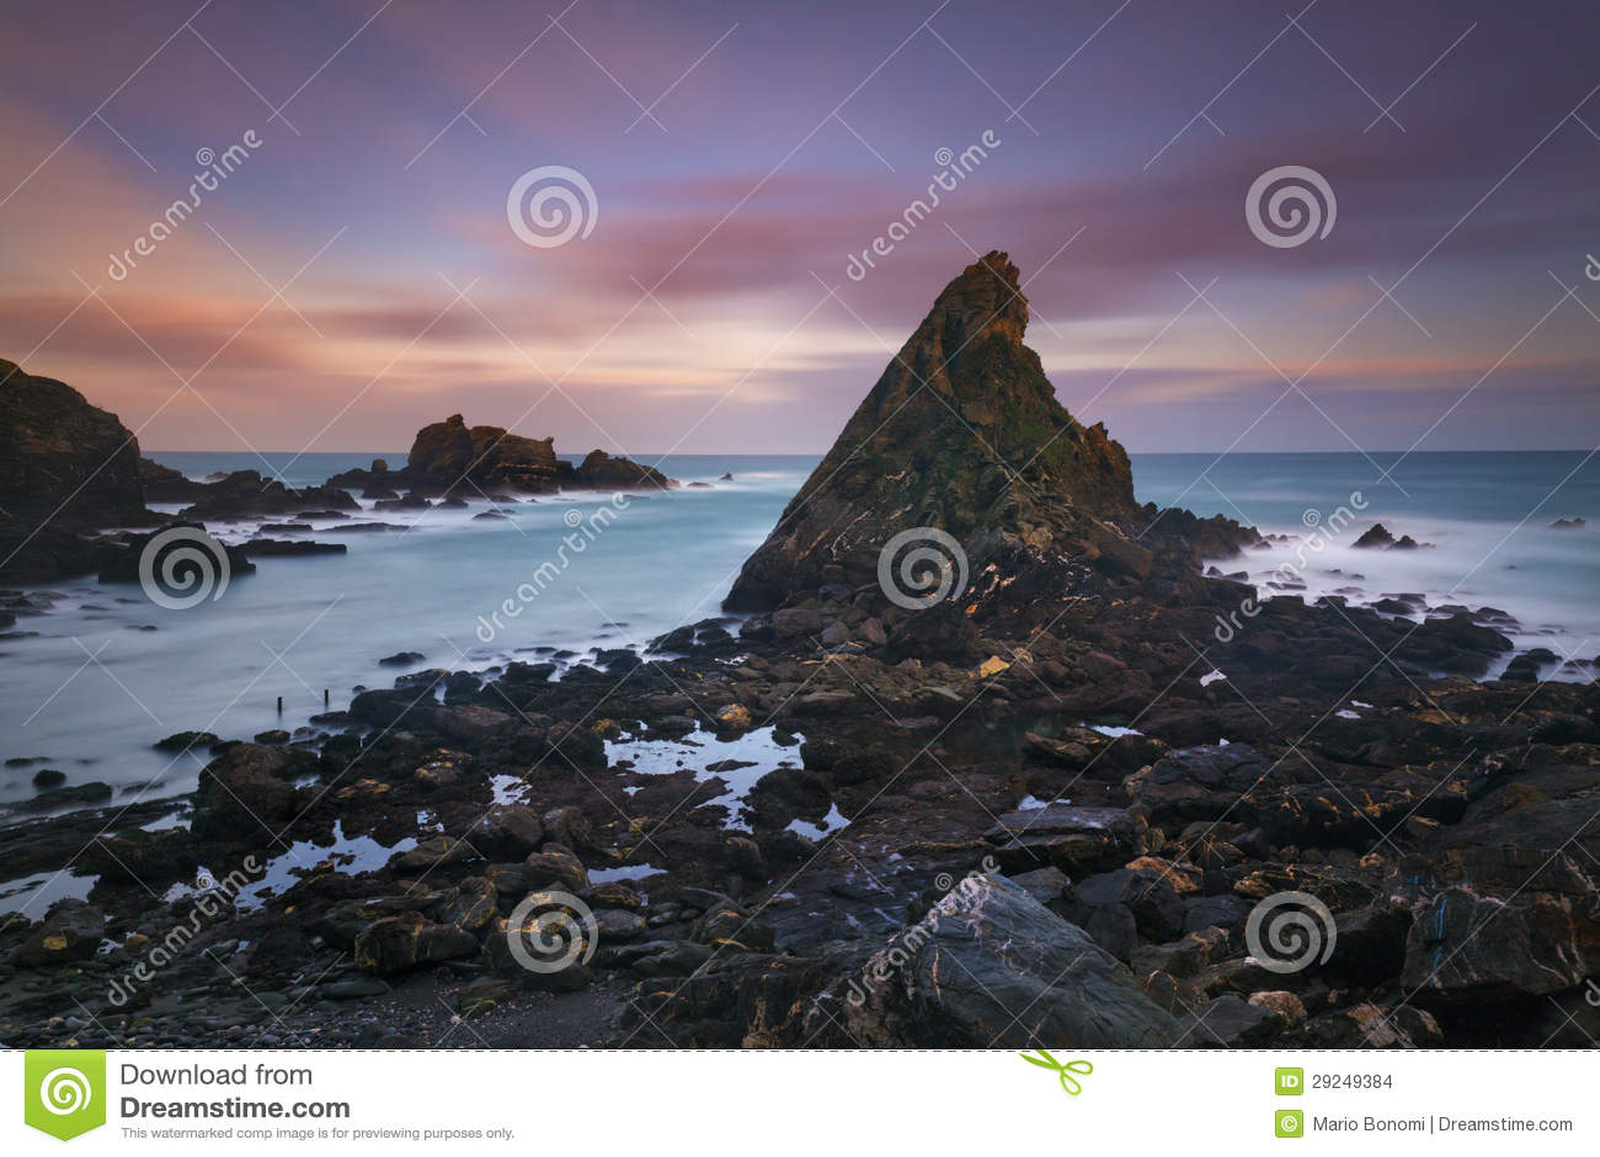 Download Costa rochosa foto de stock. Imagem de penhasco, outdoors - 29249384